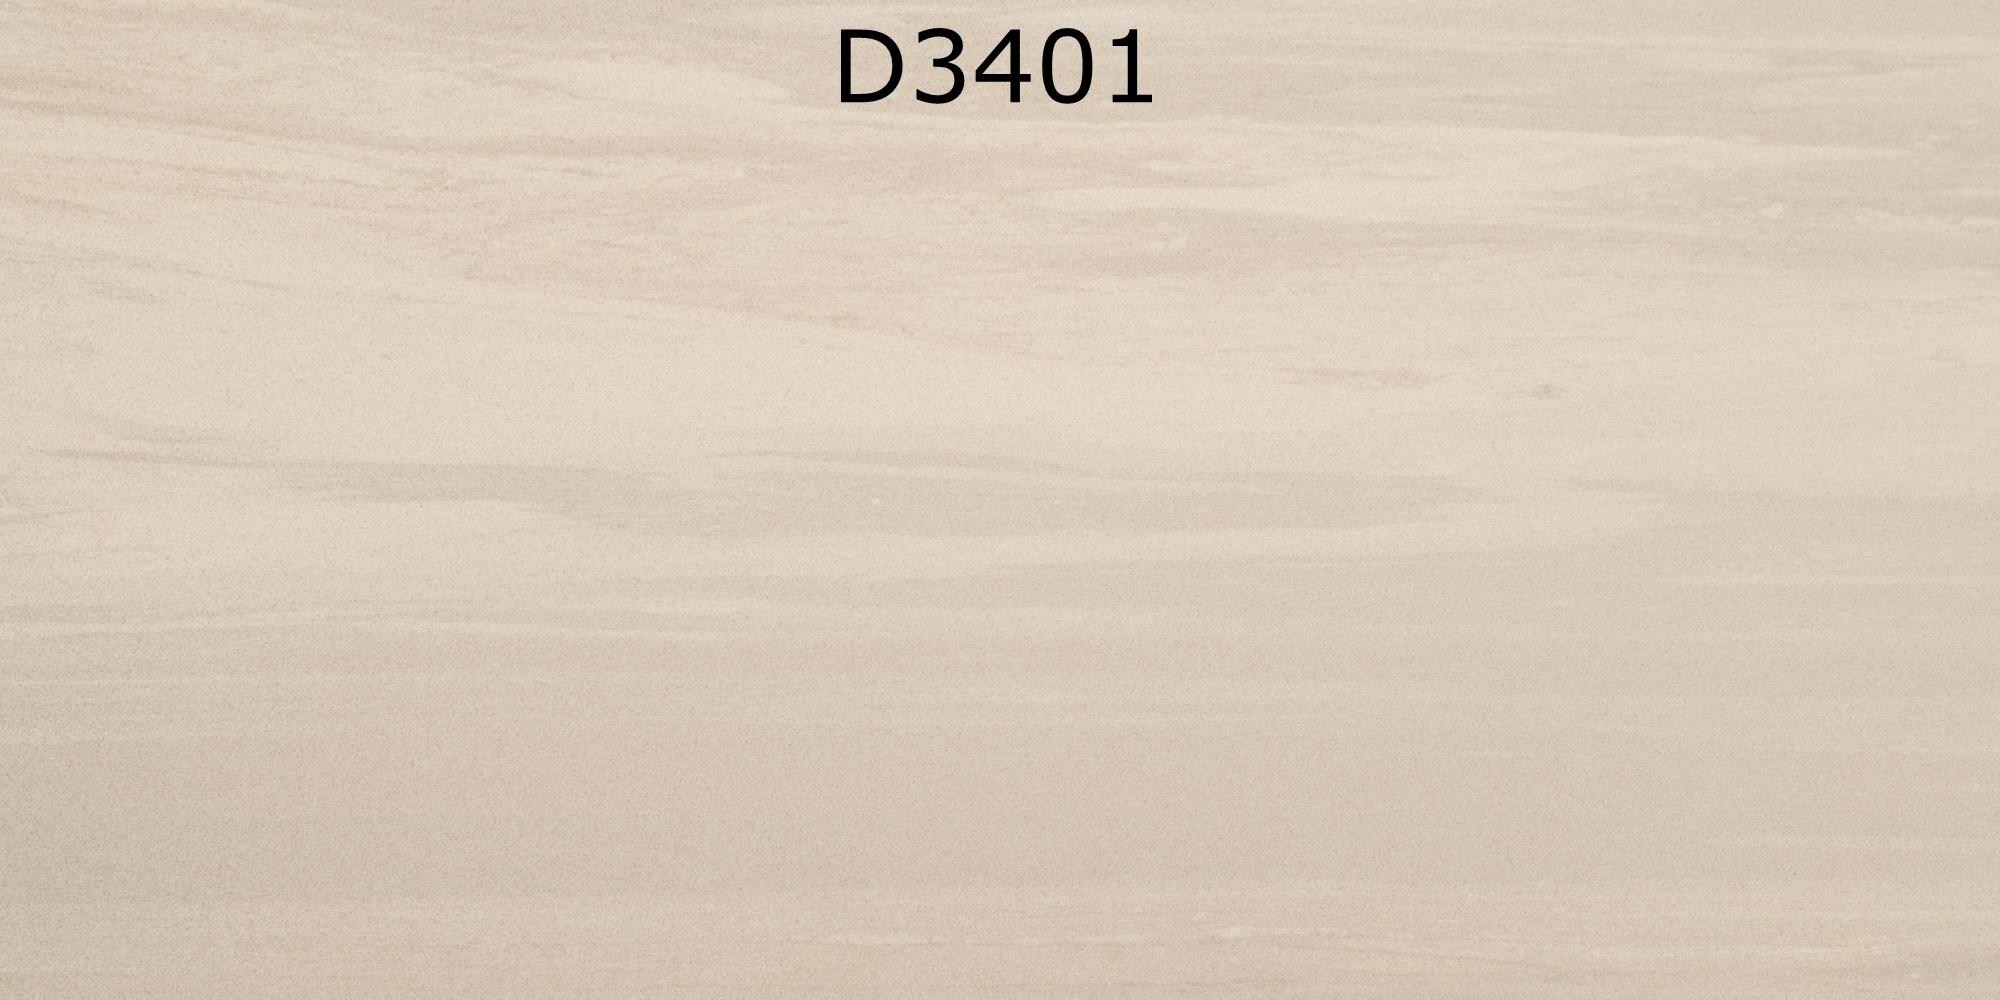 D3401